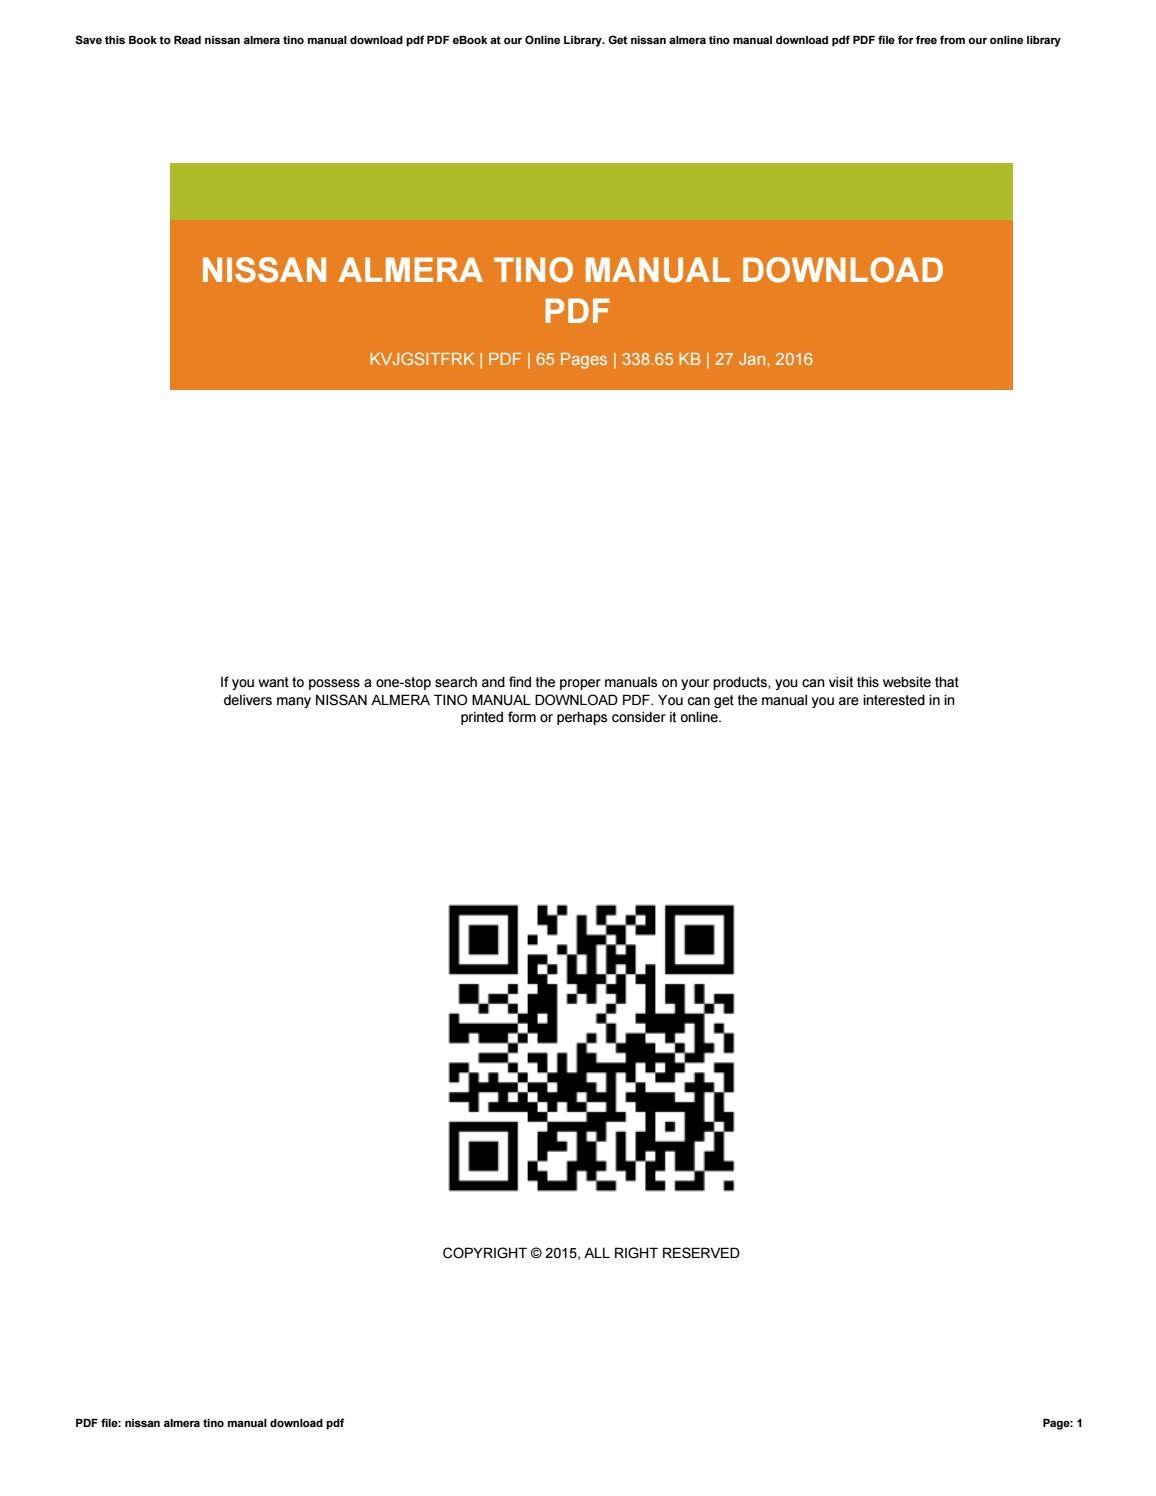 free haynes nissan almera manual